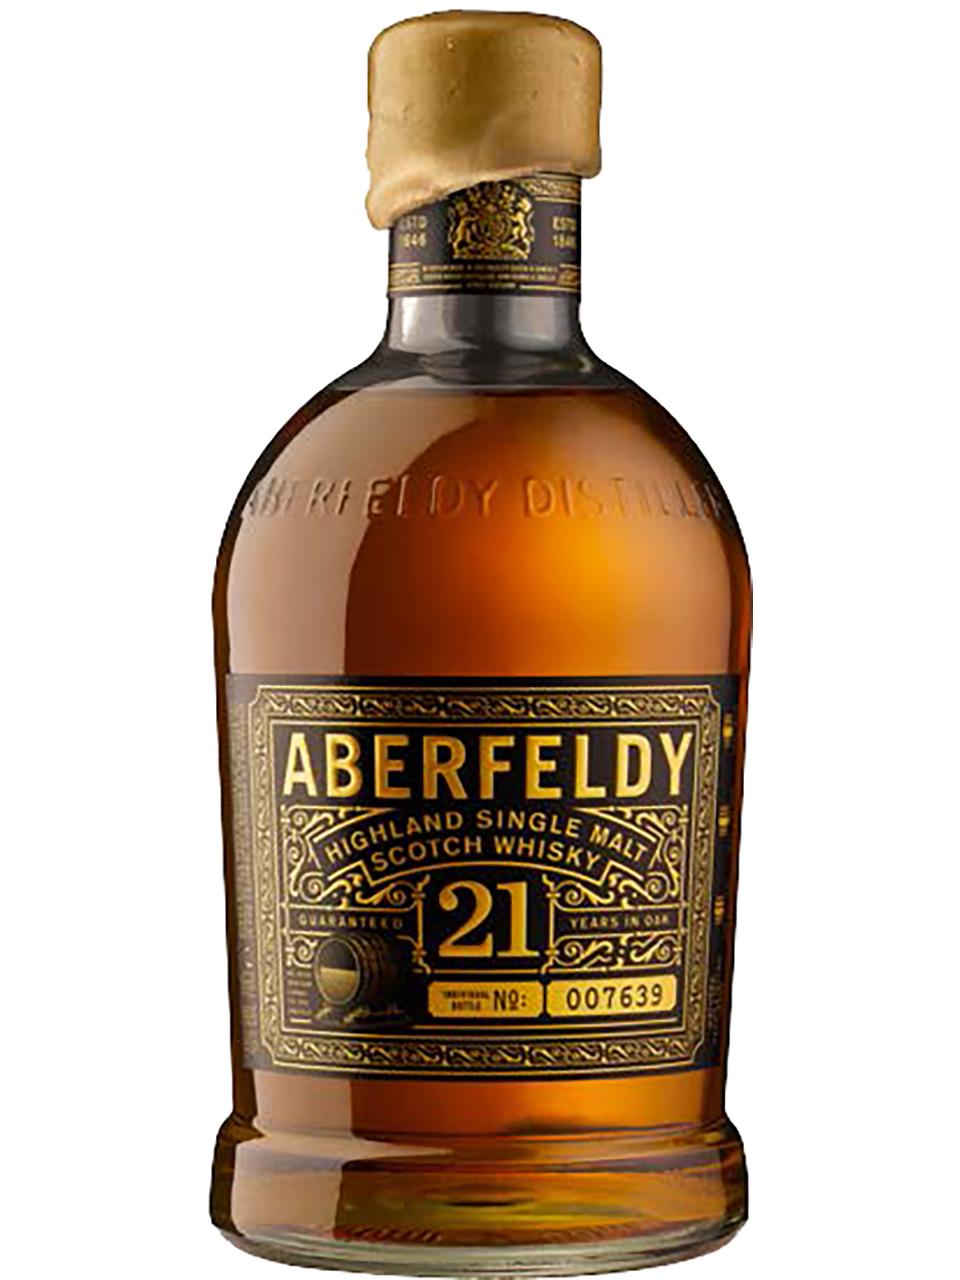 Aberfeldy 21YO Single Malt Scotch Whisky